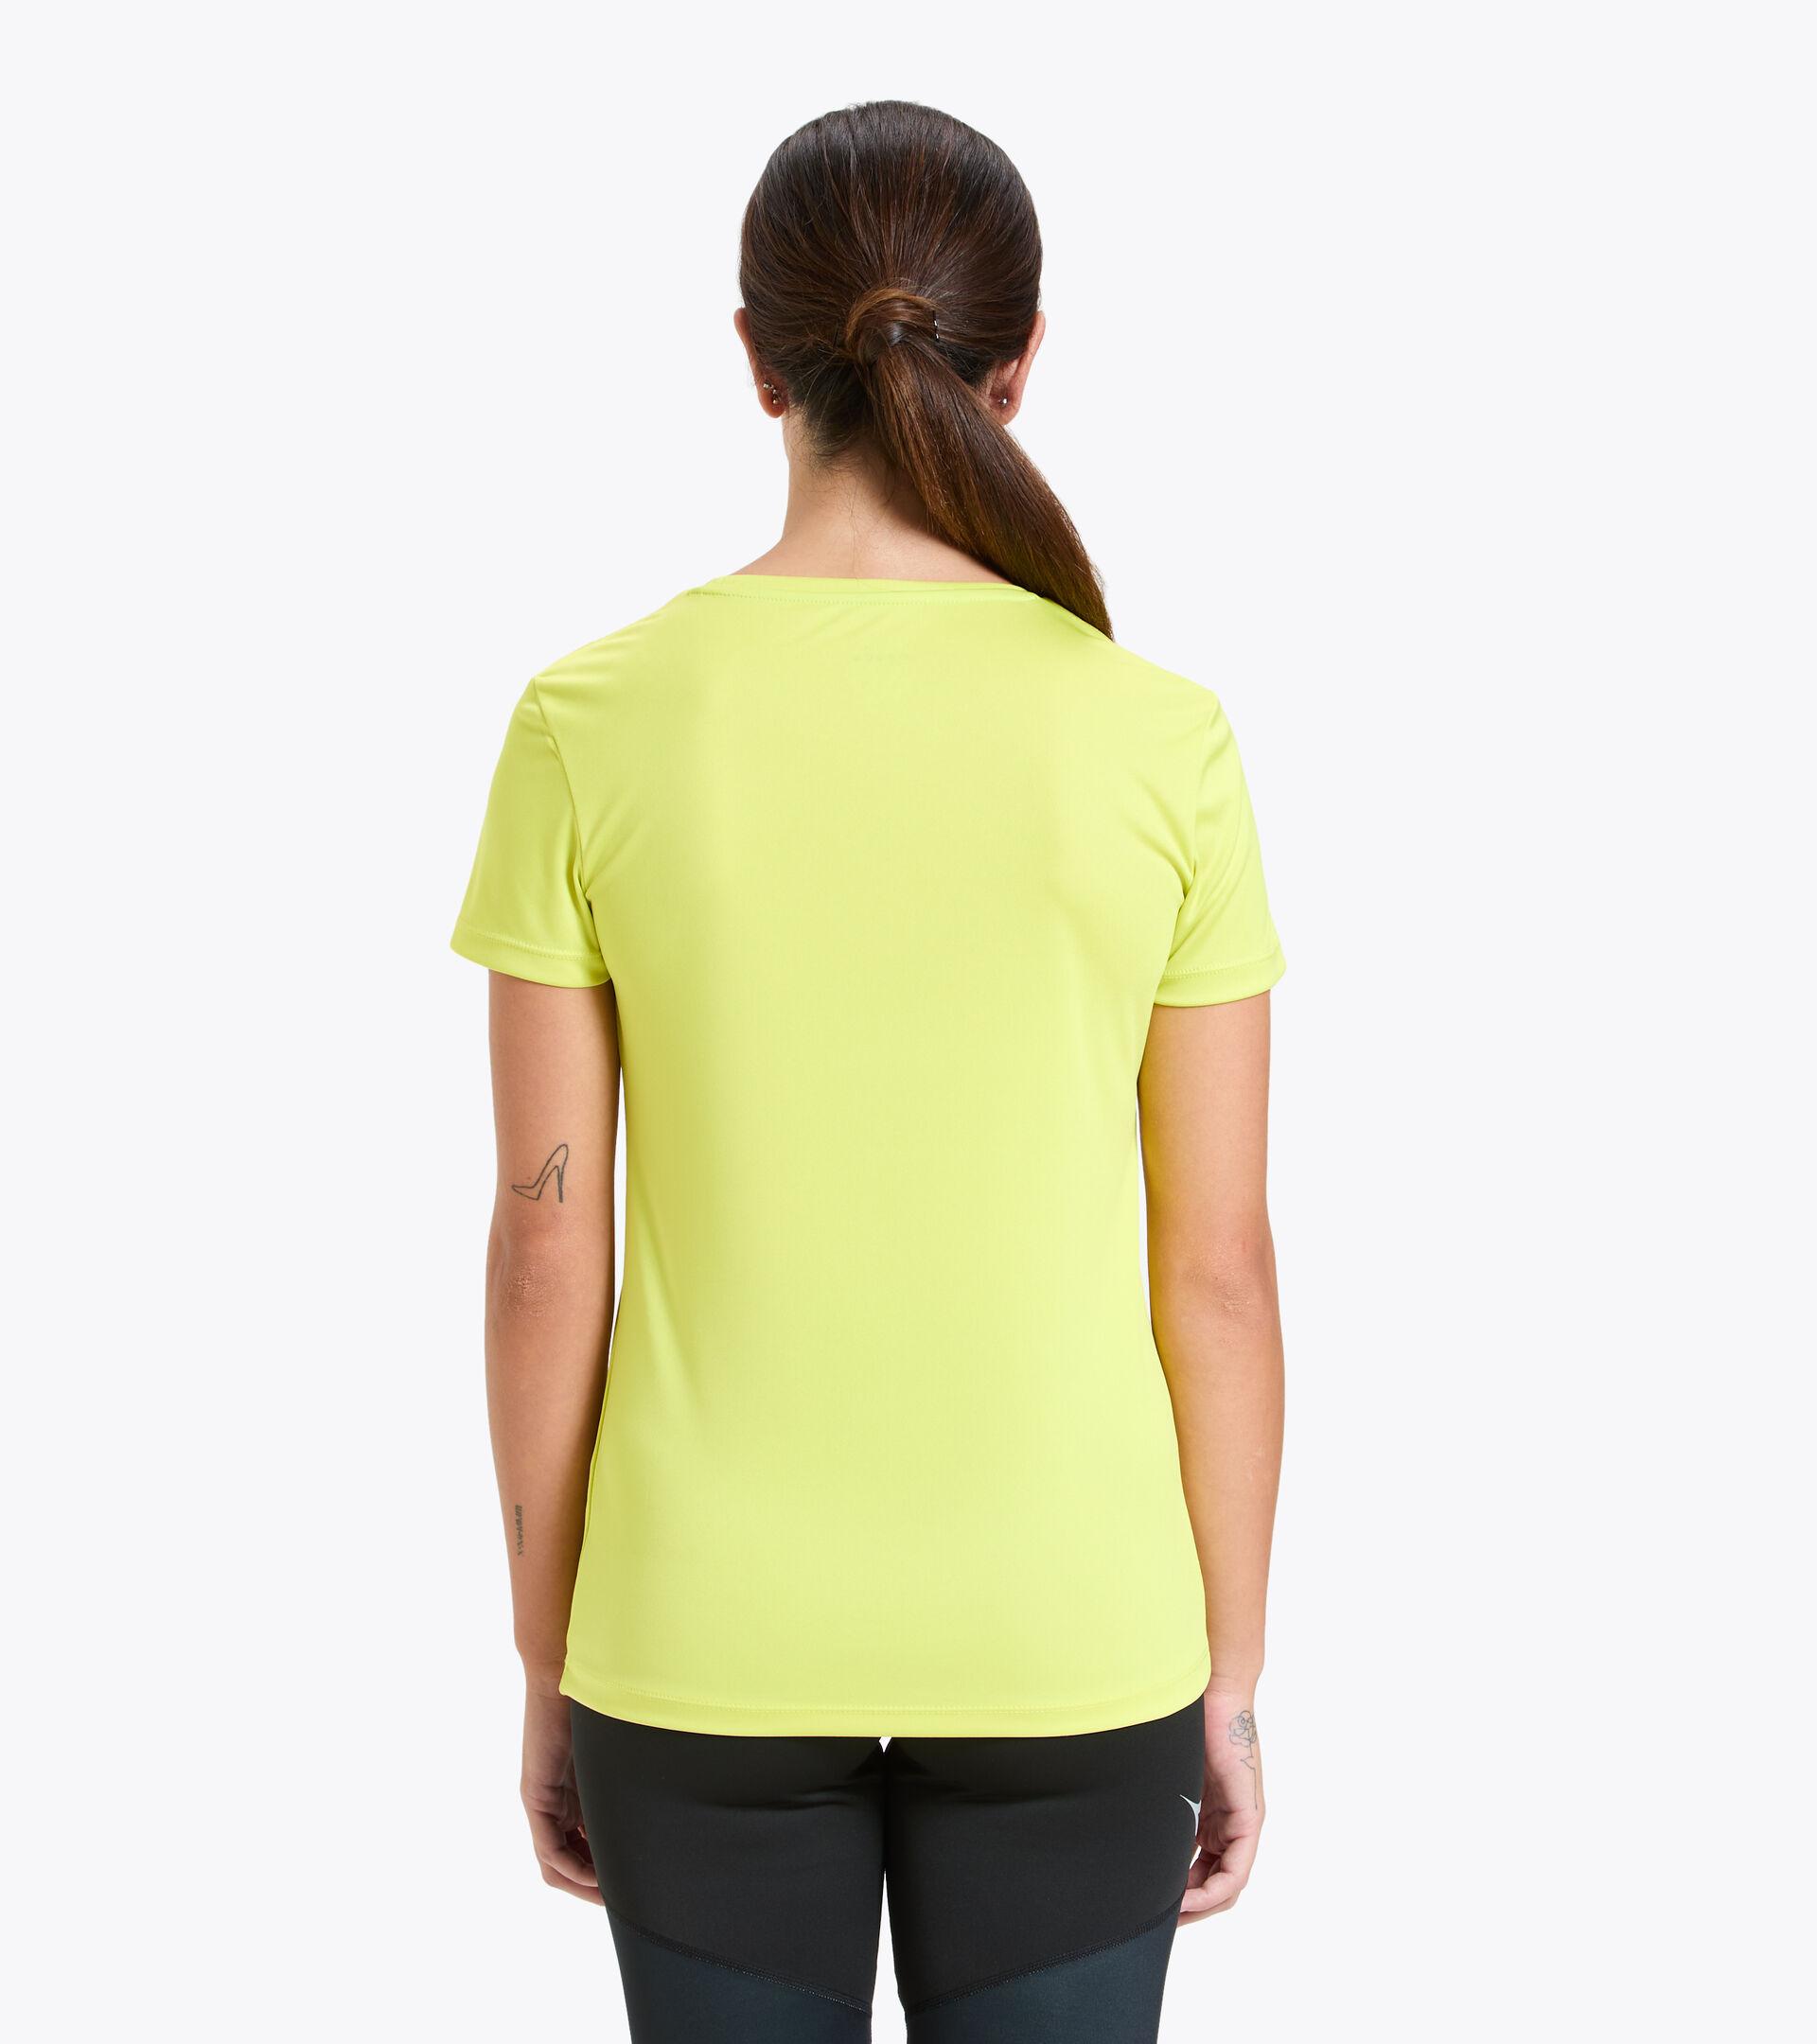 Camiseta para correr - Mujer L. SS CORE TEE MANANTIALES DE SULFURO - Diadora